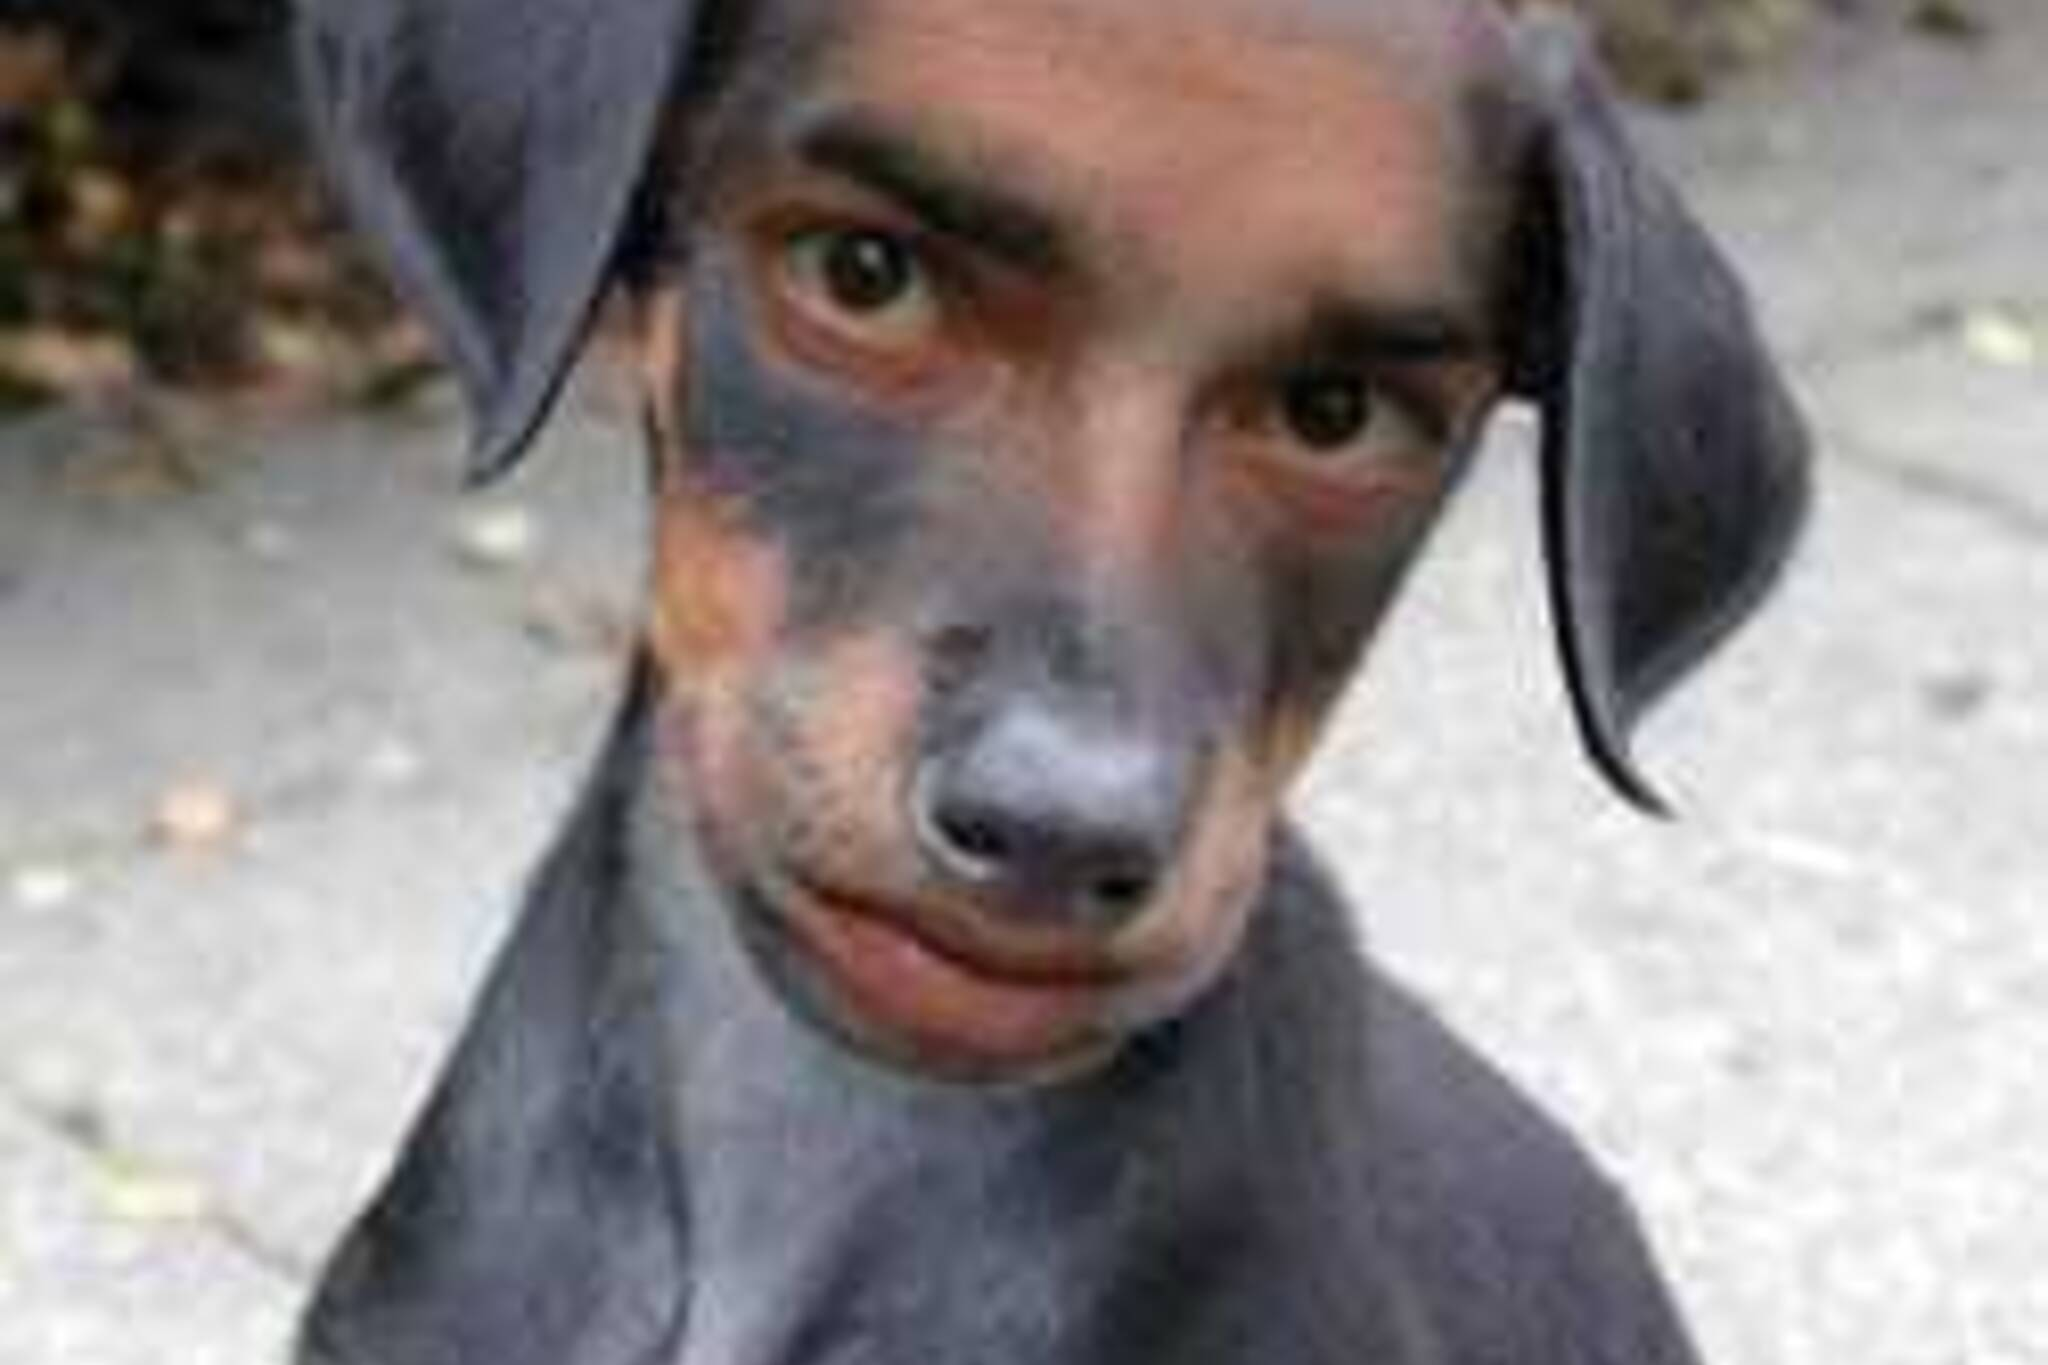 20070430_baddog_via_beagleblogger.jpg